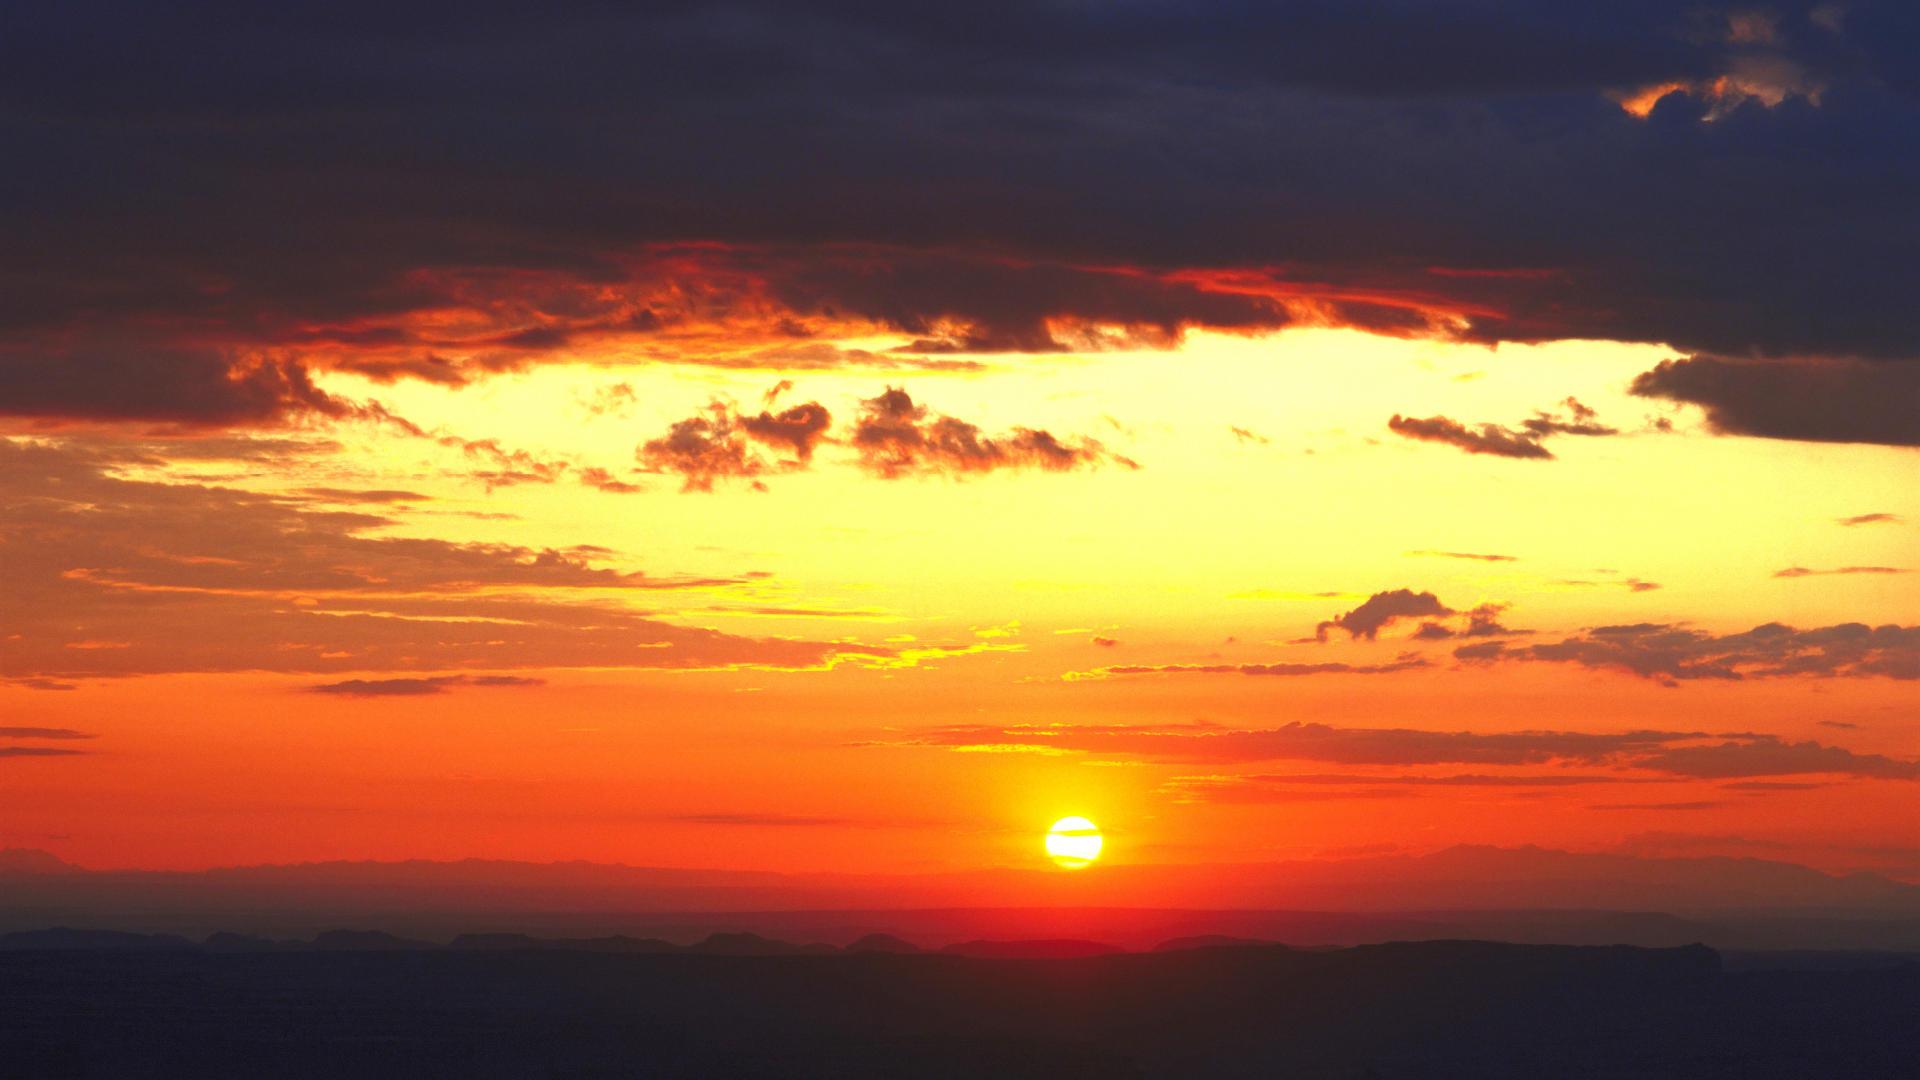 Backgrounds Navajo Arizona Desktop Sunset National Background Monument 1920x1080